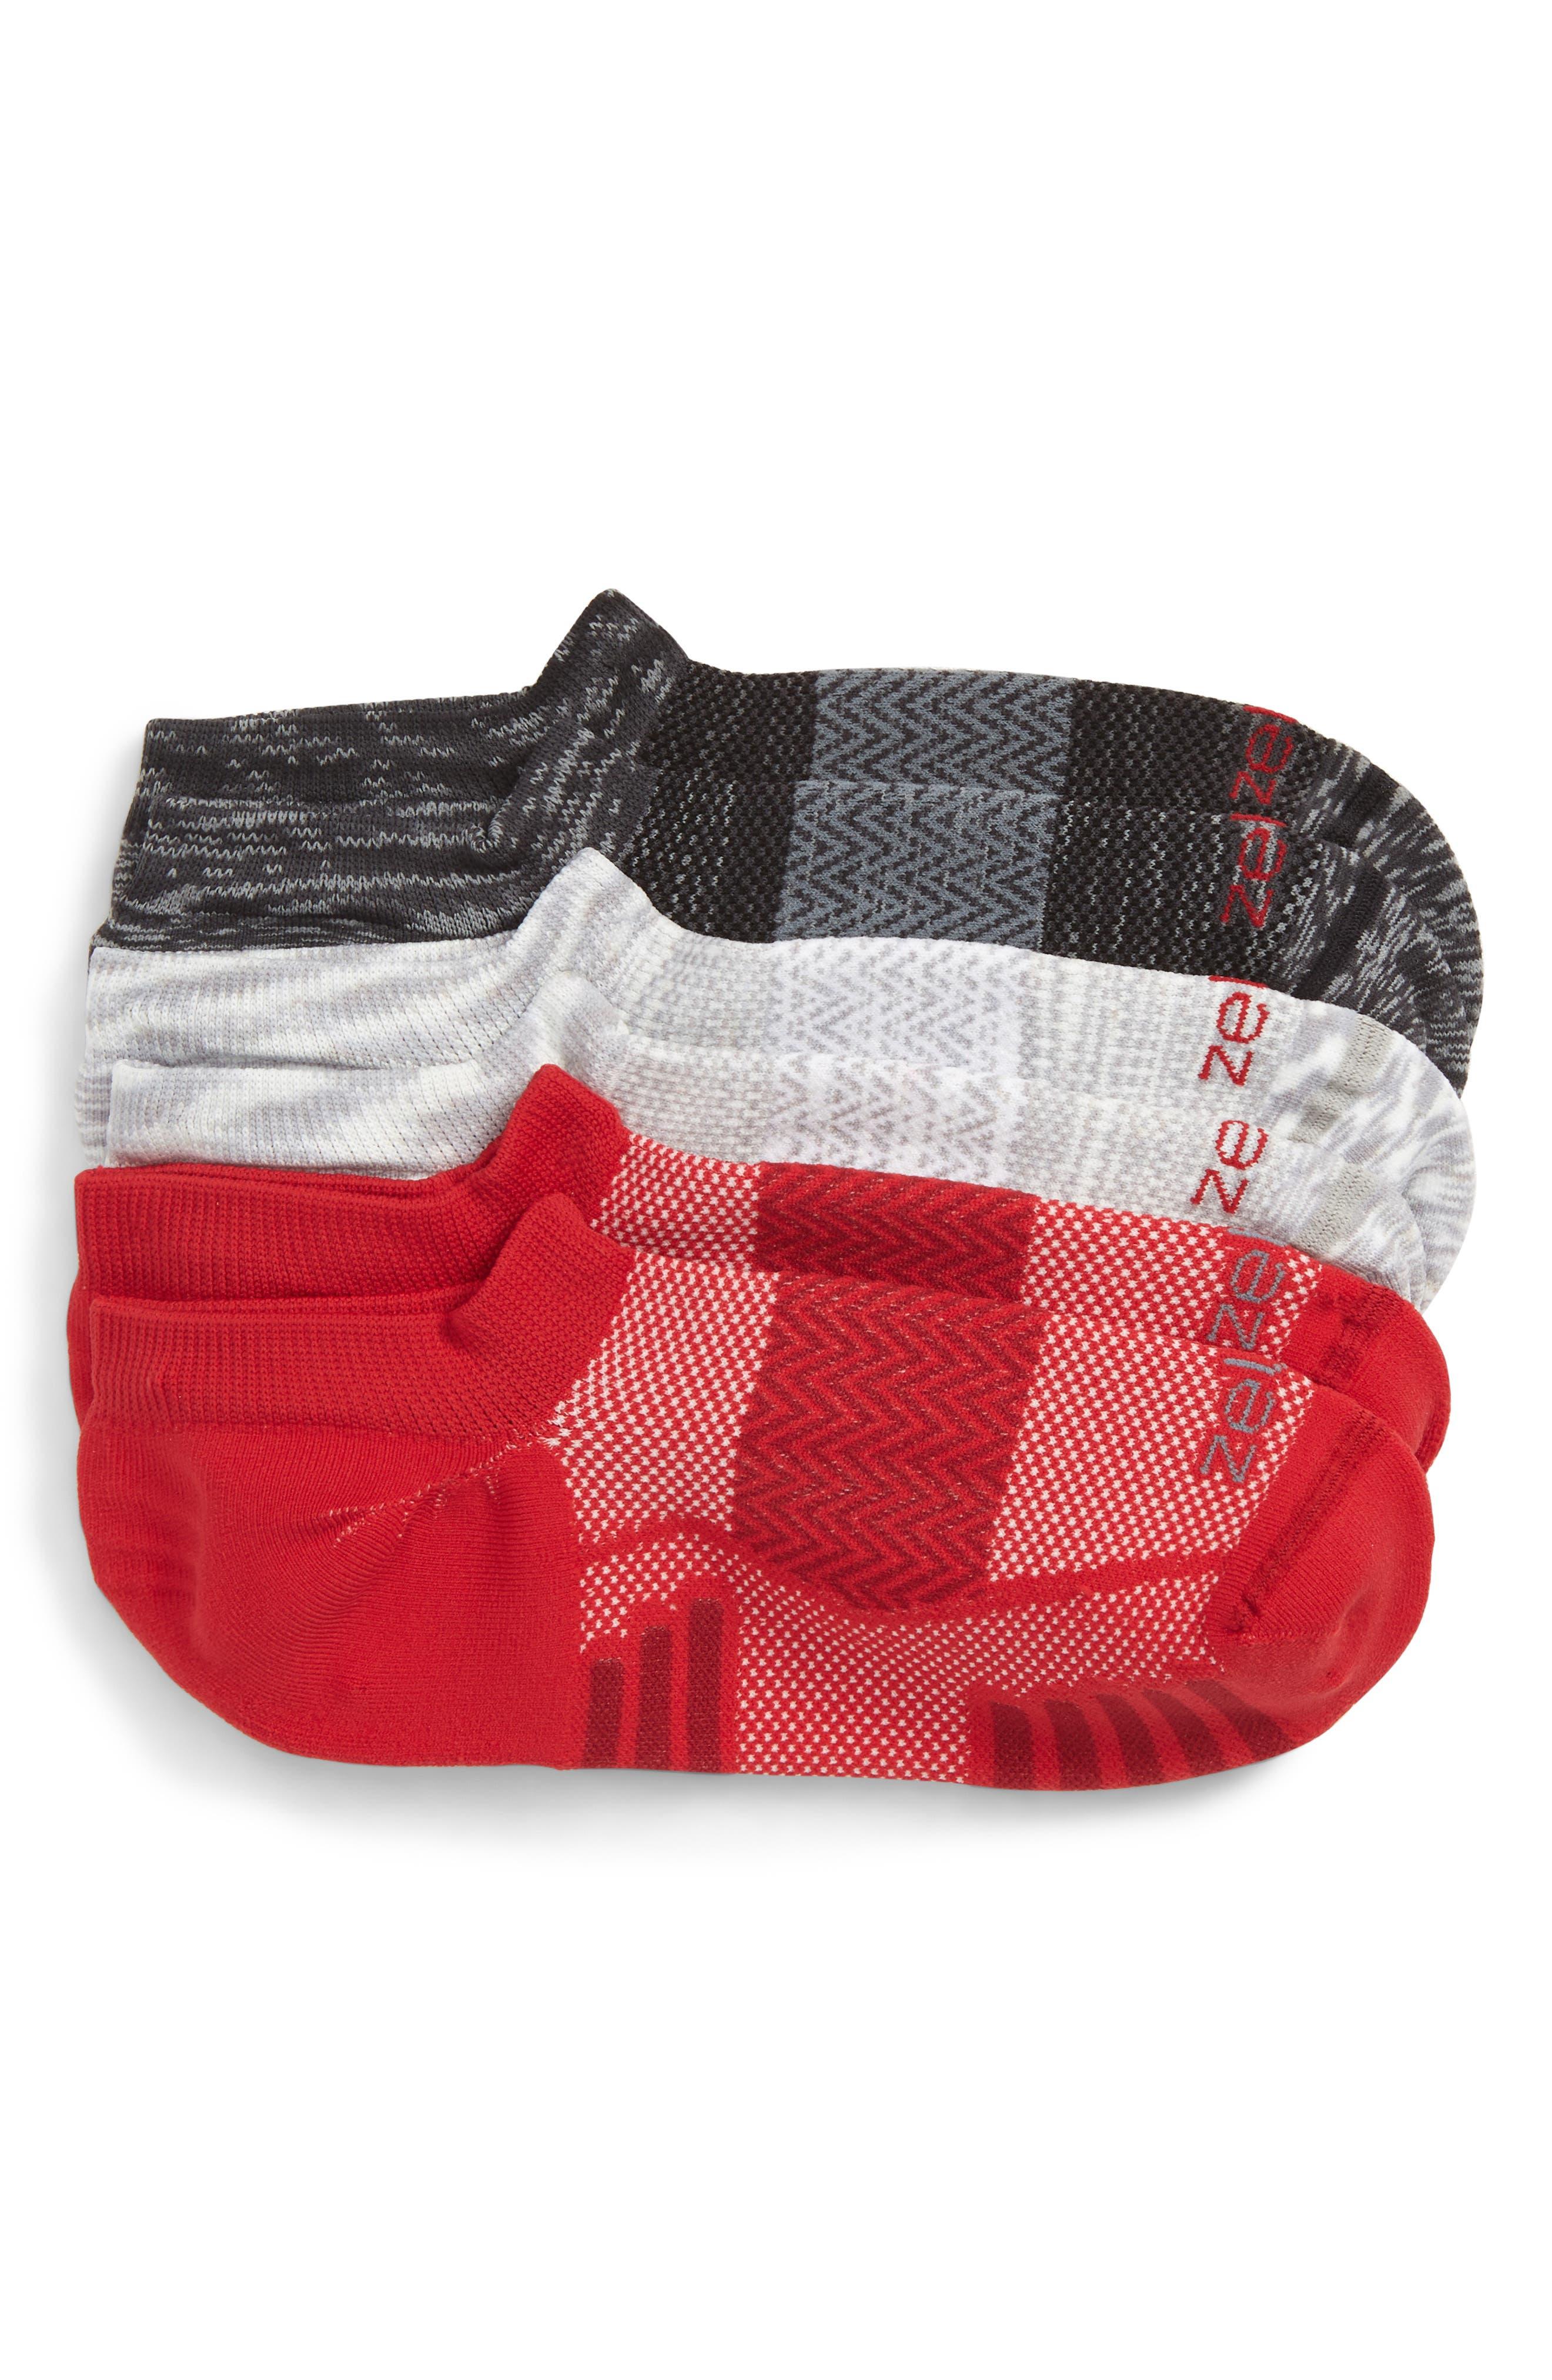 ZELLA, 3-Pack Ultra Light Running Socks, Main thumbnail 1, color, GREY/ RED/ BLACK